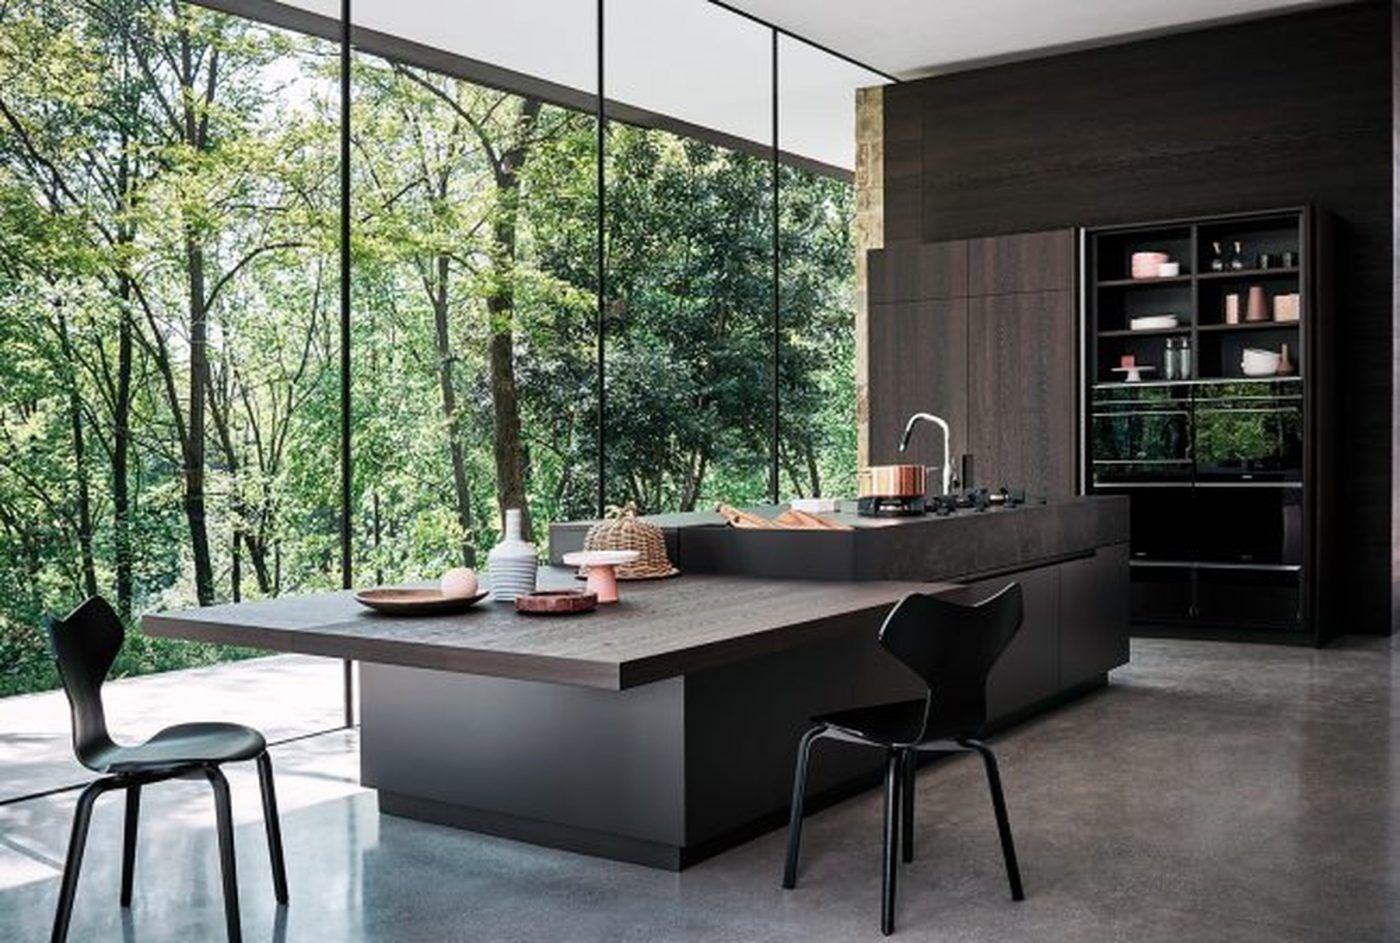 International Kitchen Projects Cesar Nyc Kitchens Modern Kitchens Italian Kitchen Cabinets Elegant Kitchens Modern Kitchen Design